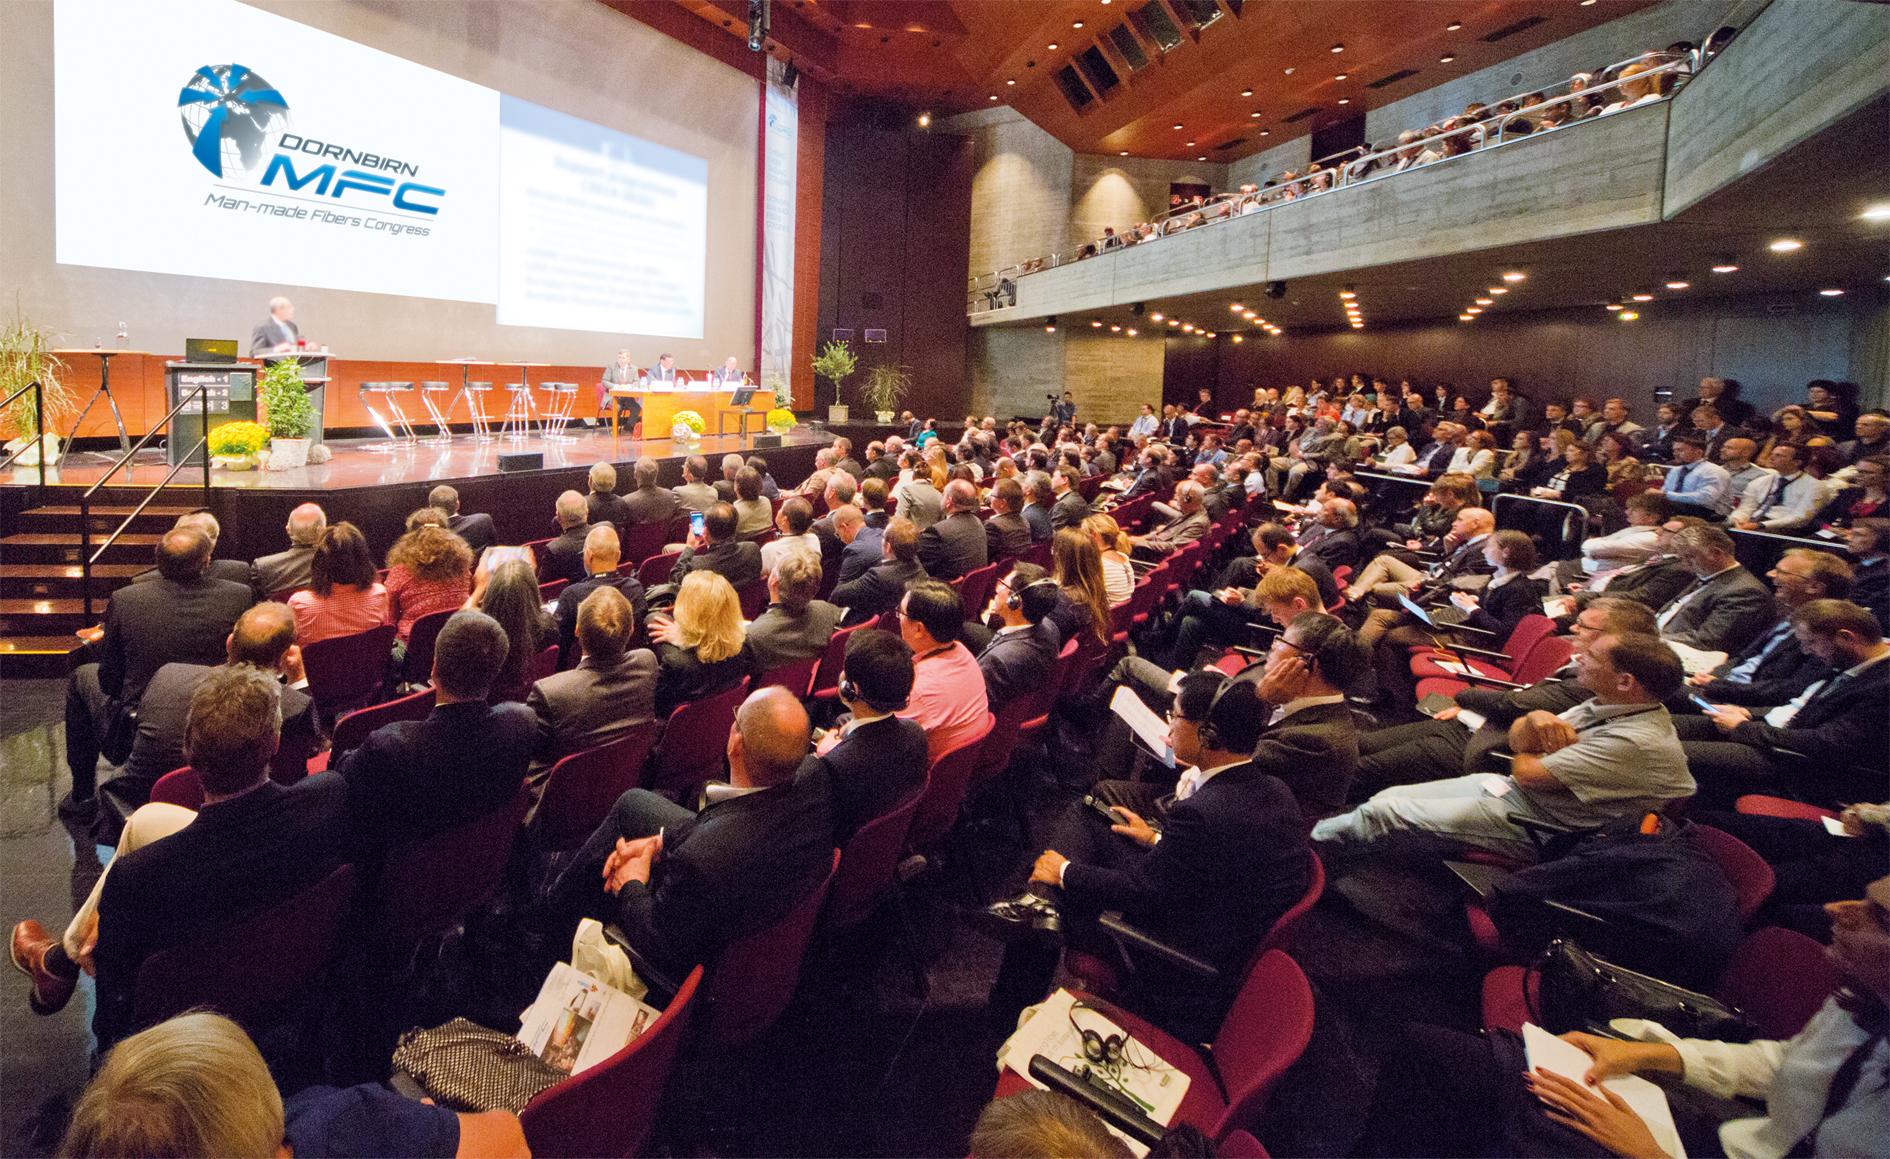 MFC, Man-Made Fibers Congress, Edana, Feria de Frankfurt, Dornbirn, congreso sobre fibras artificiales, textiles de uso sanitario, textiles de uso protectivo, textiles de uso deportivo, Avantex, Techtextiol, Wolford